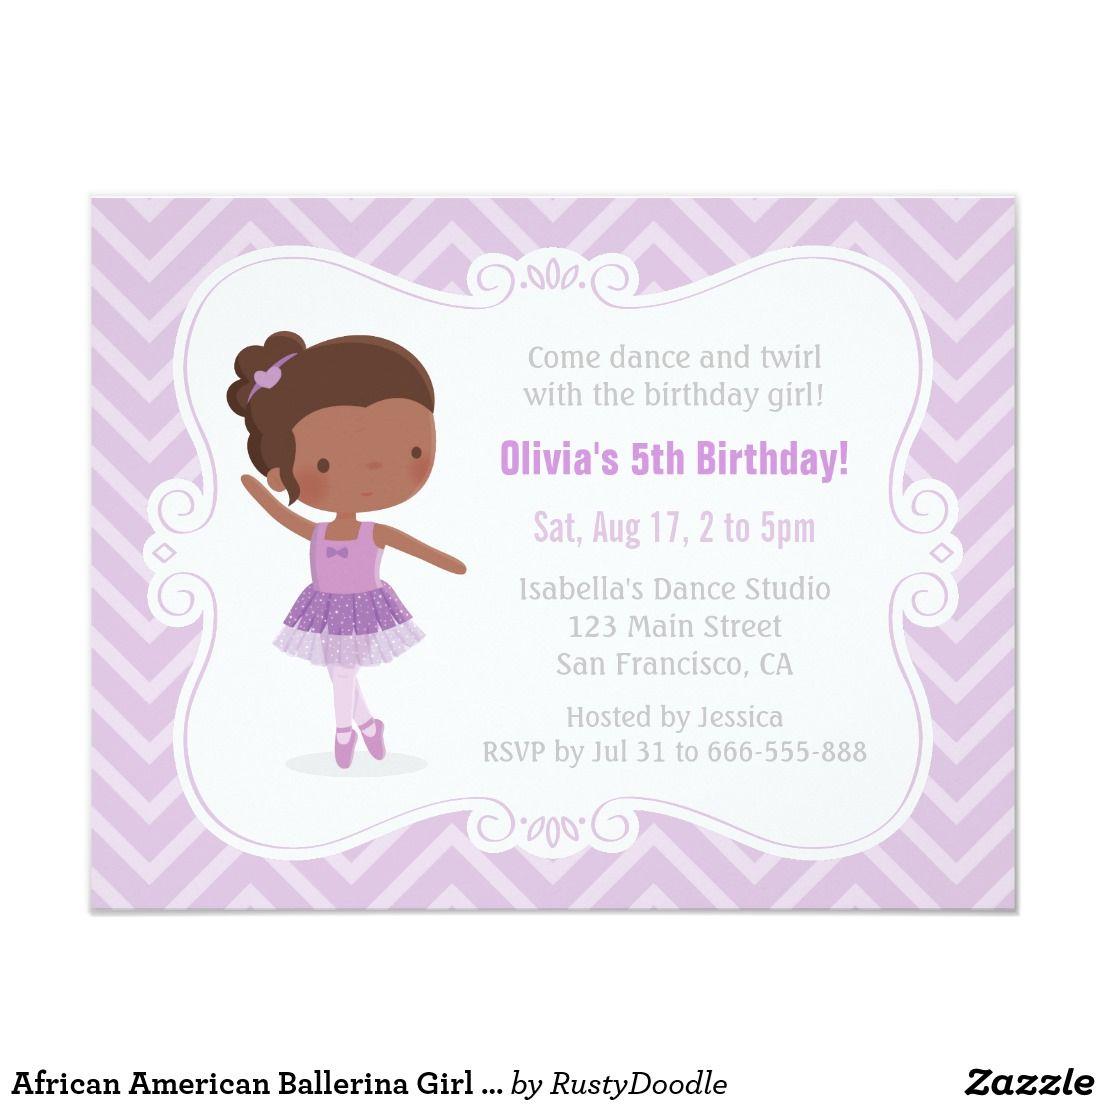 African American Ballerina Girl Birthday Party Invitation ...